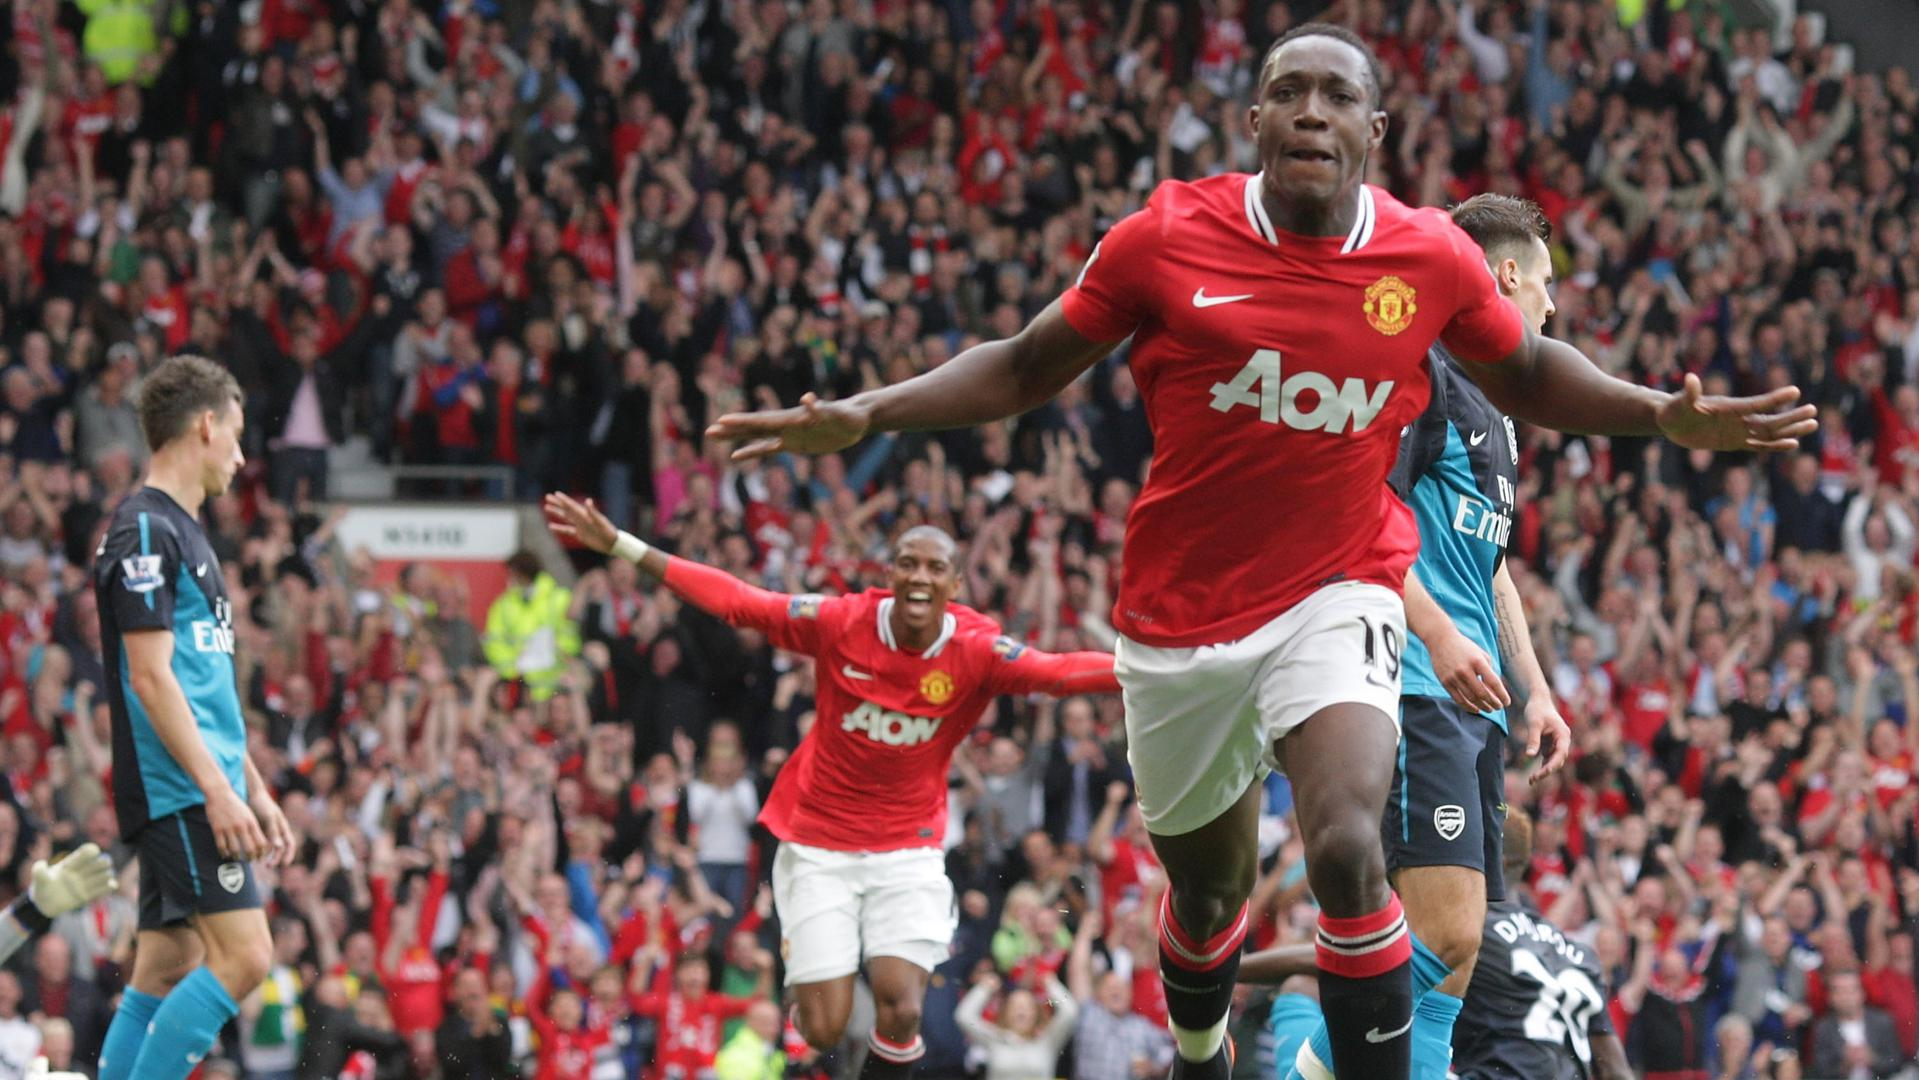 Match Rewind Live Stream Of Man Utd 8 Arsenal 2 Manchester United